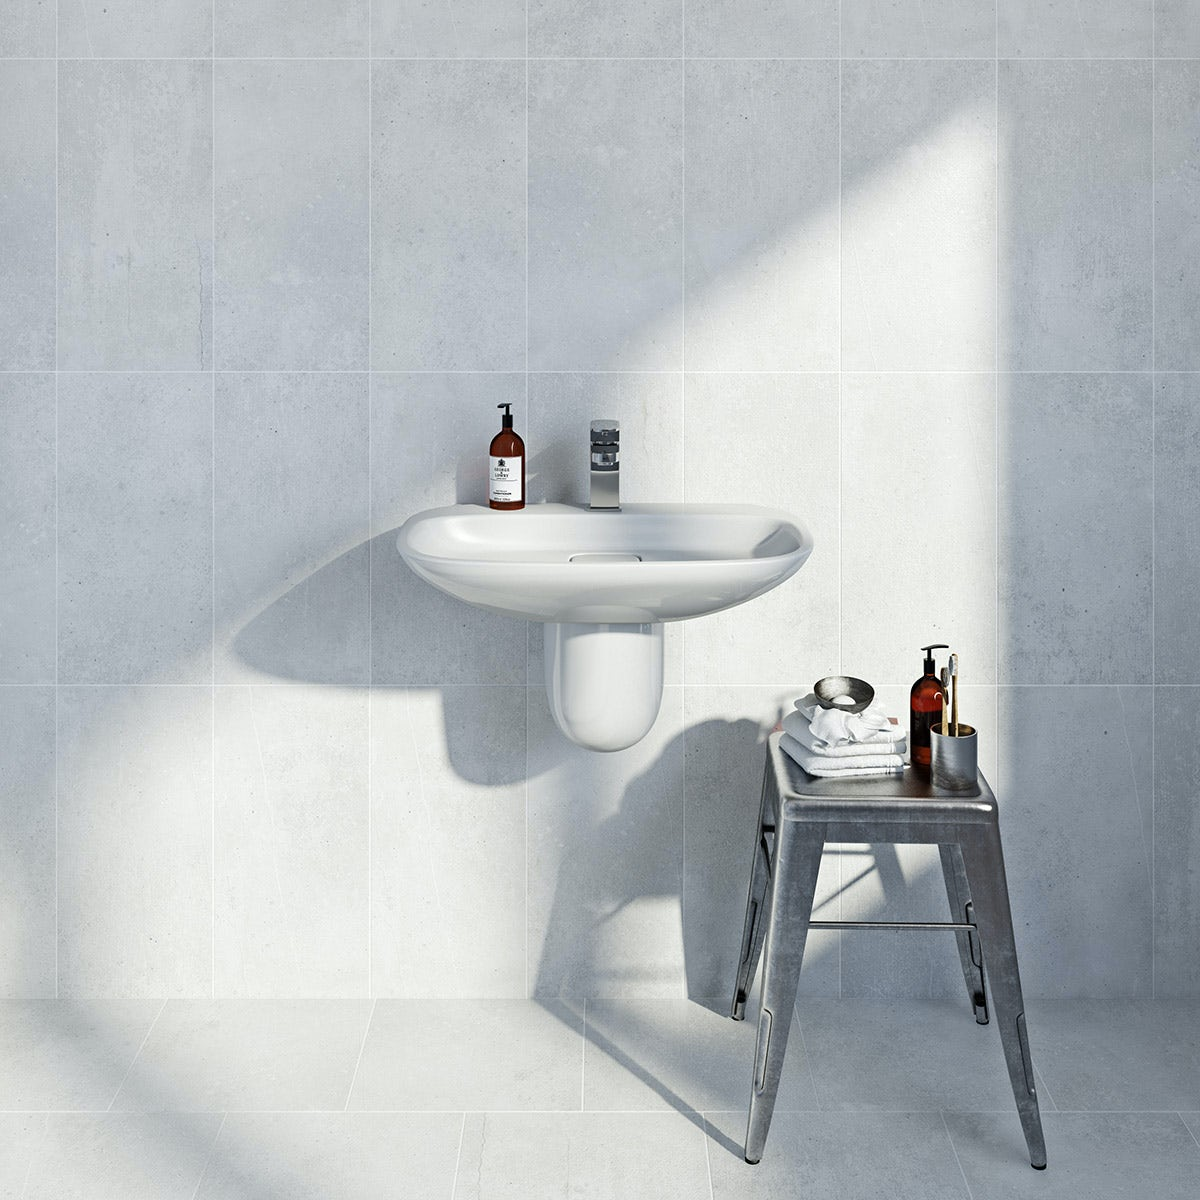 British Ceramic Tile Metropolis light grey matt tile 248mm x 498mm - Sold by Victoria Plum